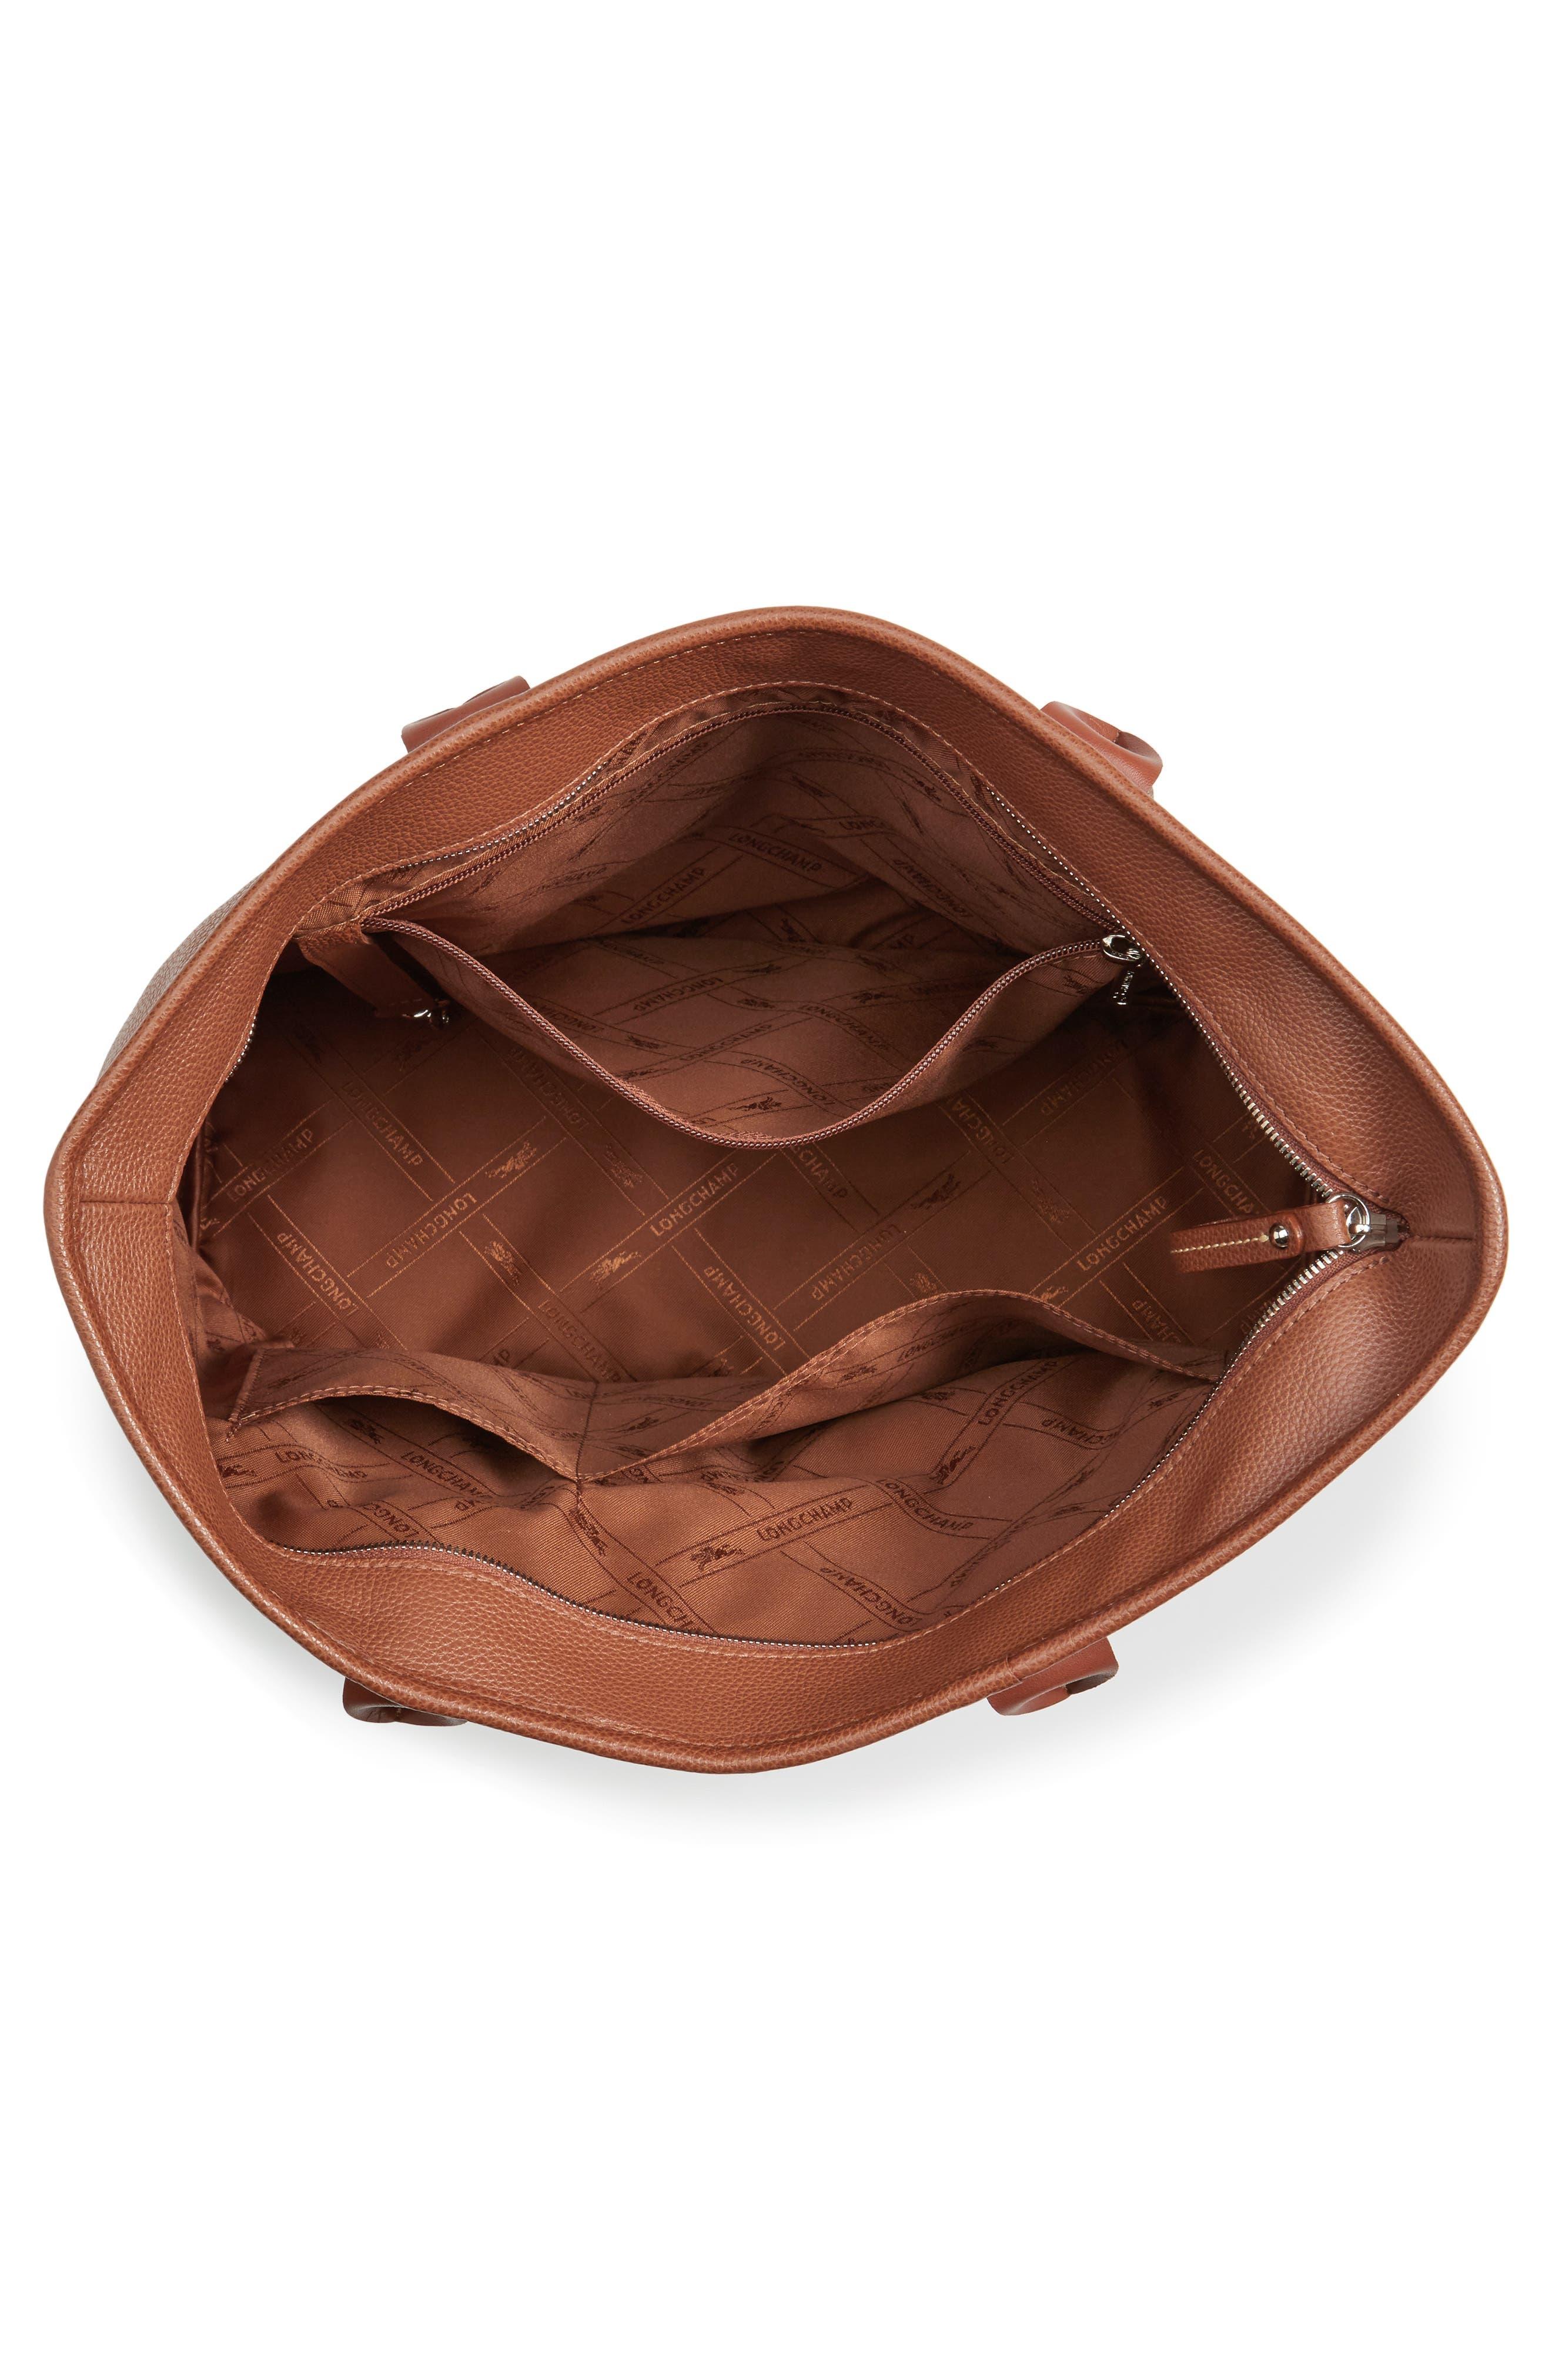 'Veau' Leather Tote,                             Alternate thumbnail 4, color,                             200